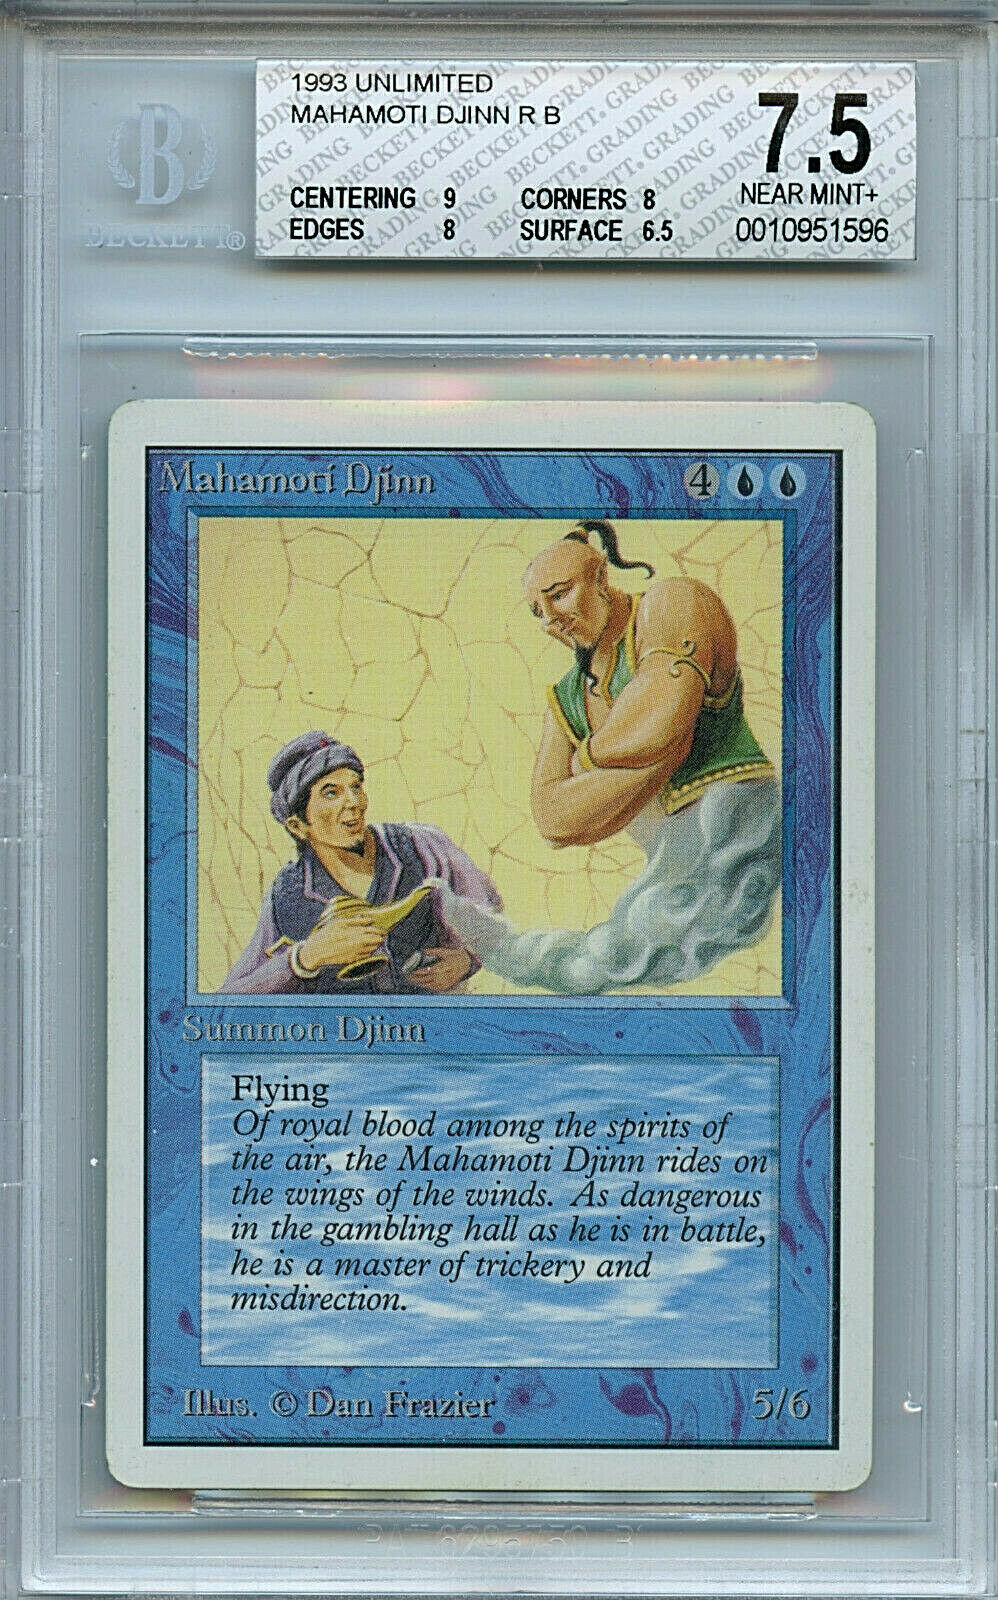 MTG Unlimited Mahamoti Djinn BGS 7.5 NM+ Card Magic Amricons 1596